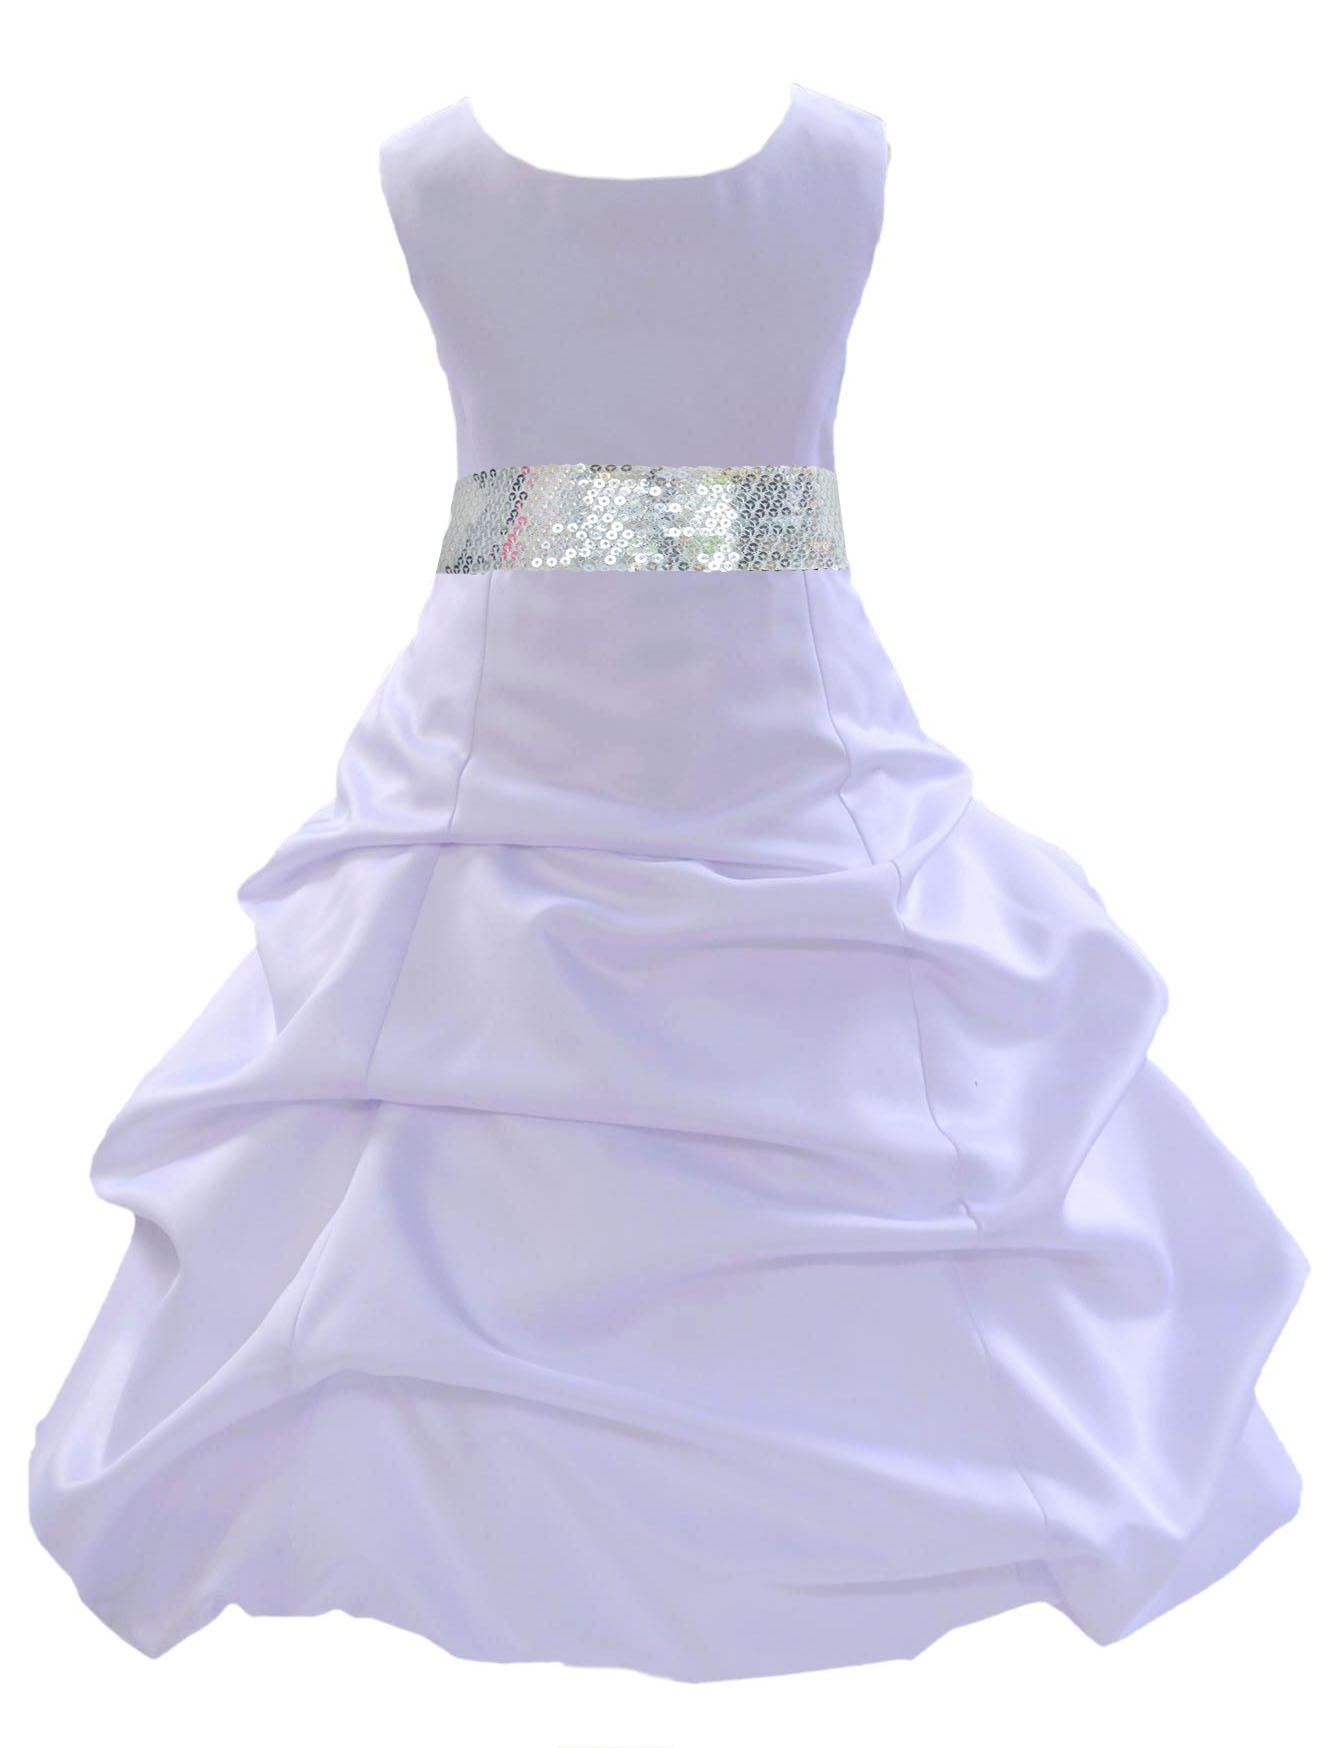 Pageant Formal Flower Girl First Communion Wedding Dress 2 4 6 8 10 12 14 White